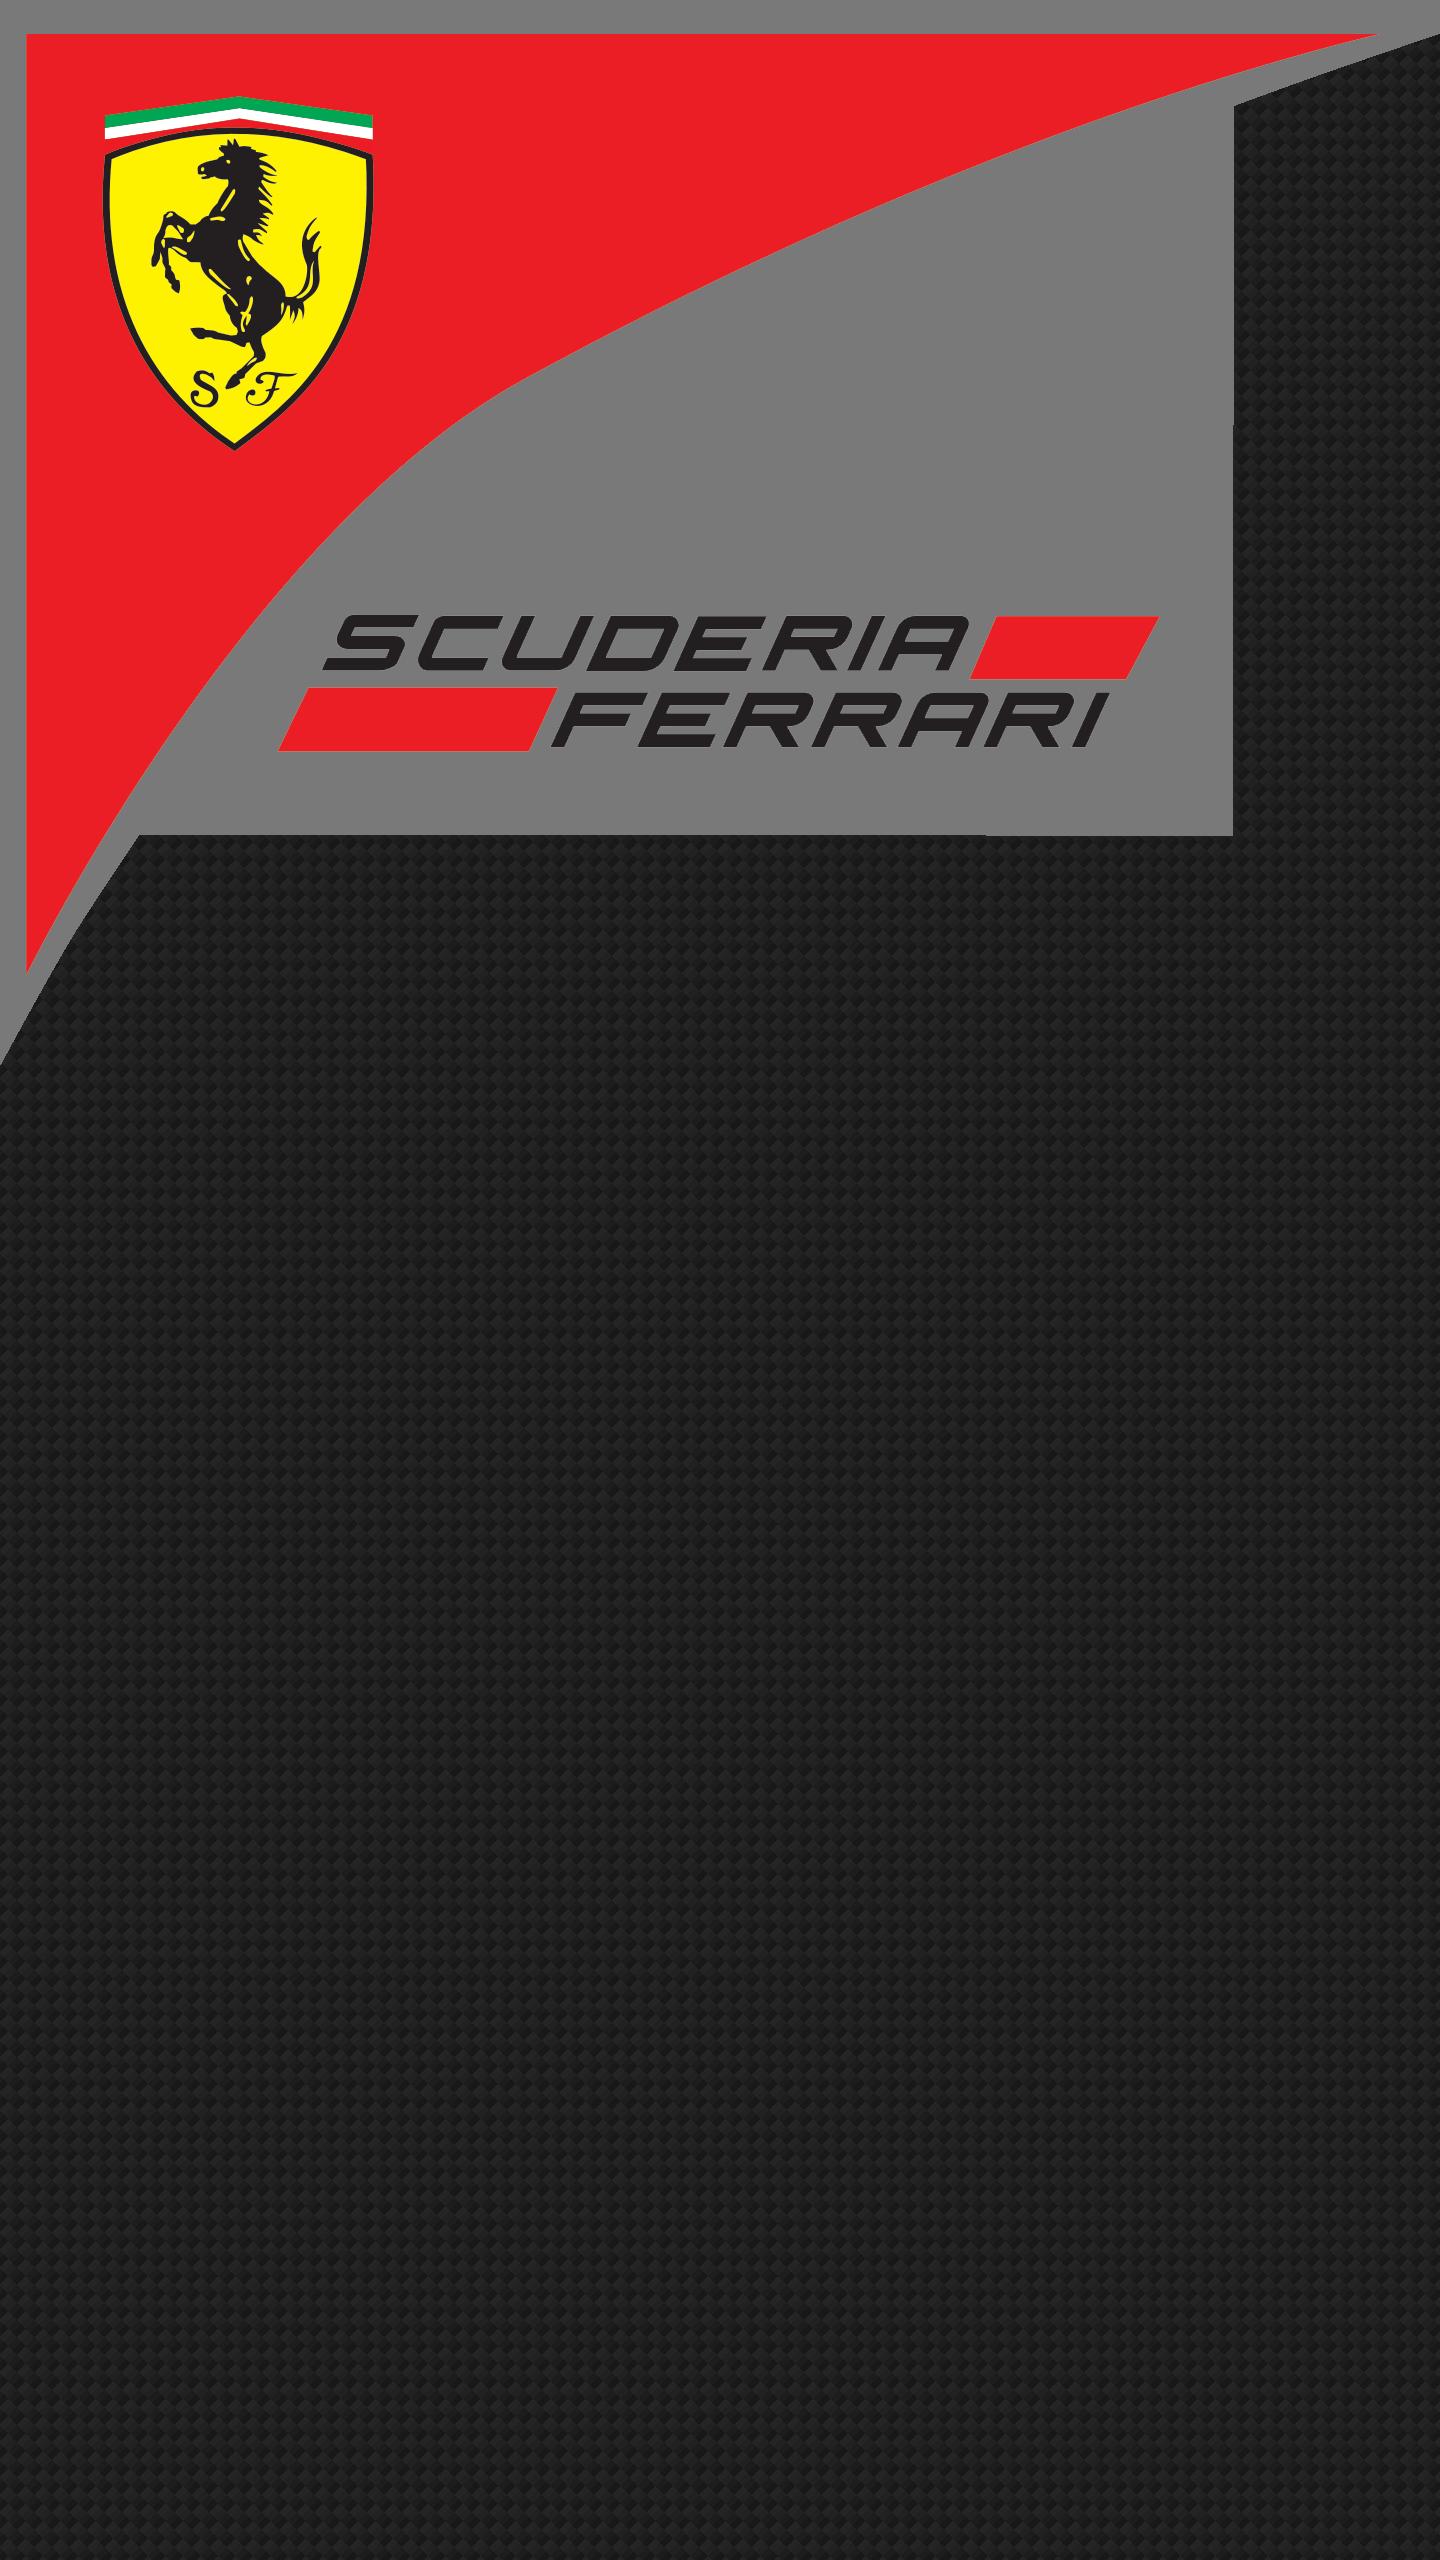 Scuderia Ferrari Wallpapers Wallpaper Cave